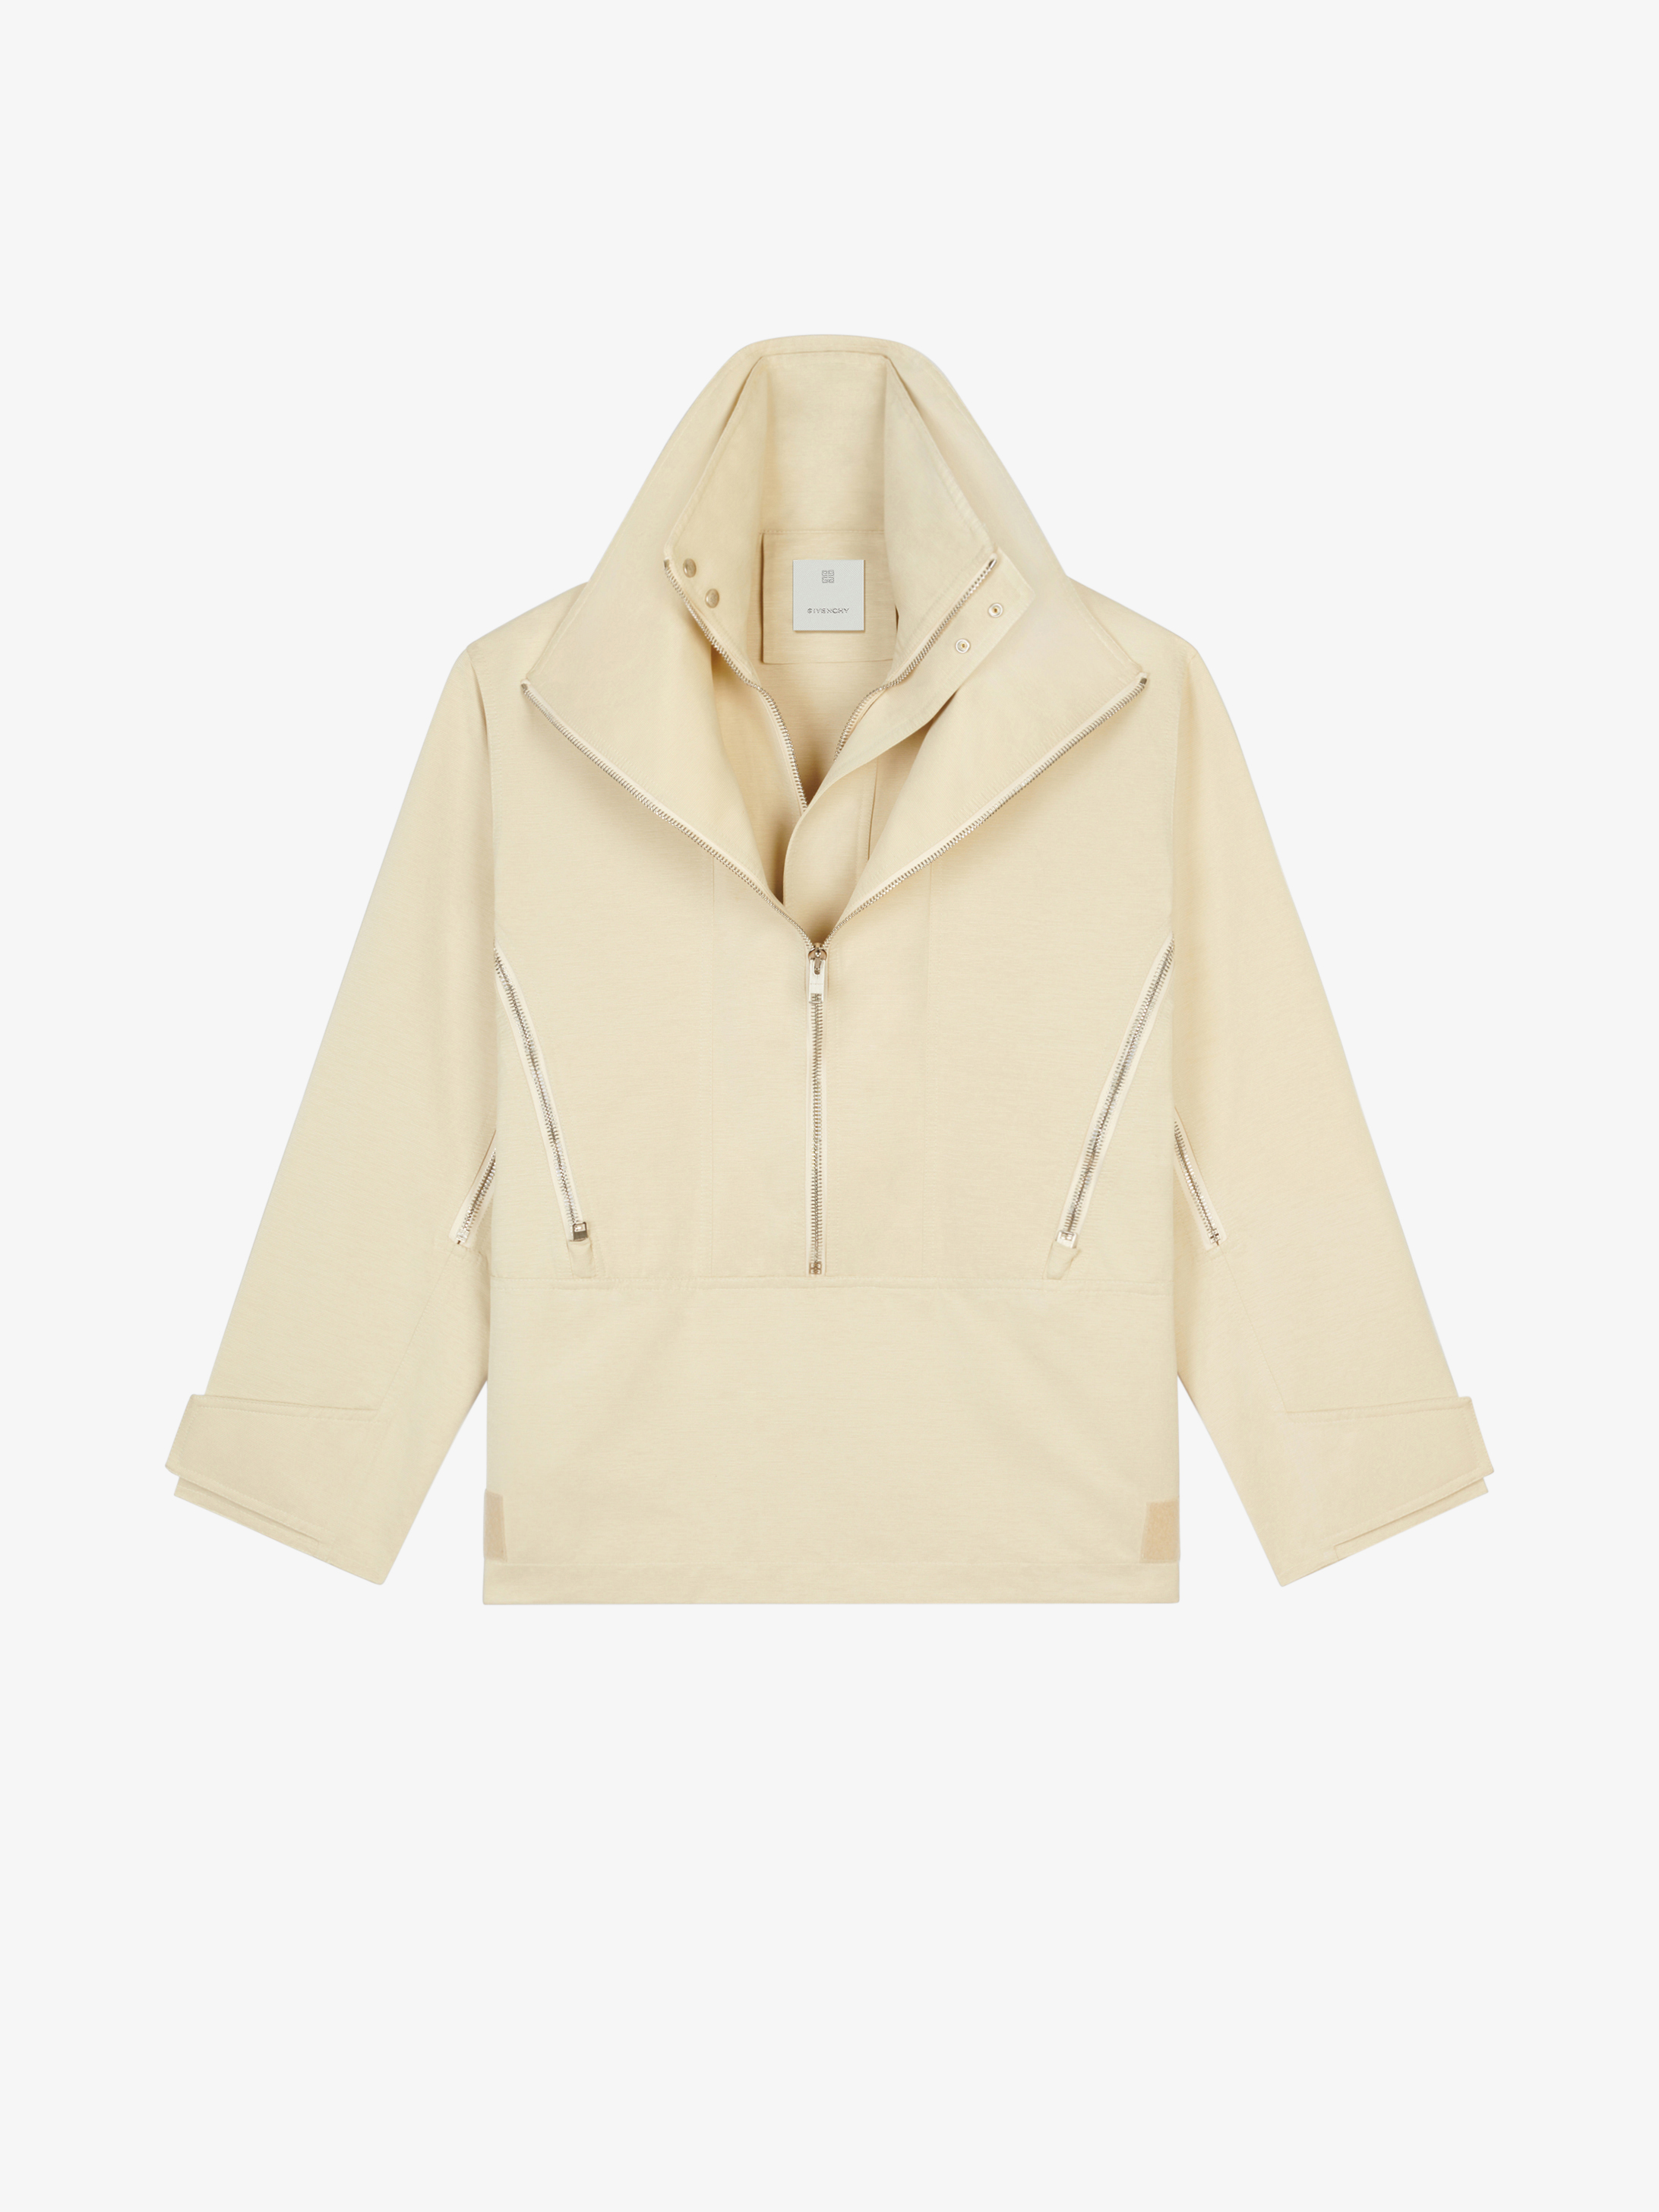 Pullover giacca a vento in ottoman con zip